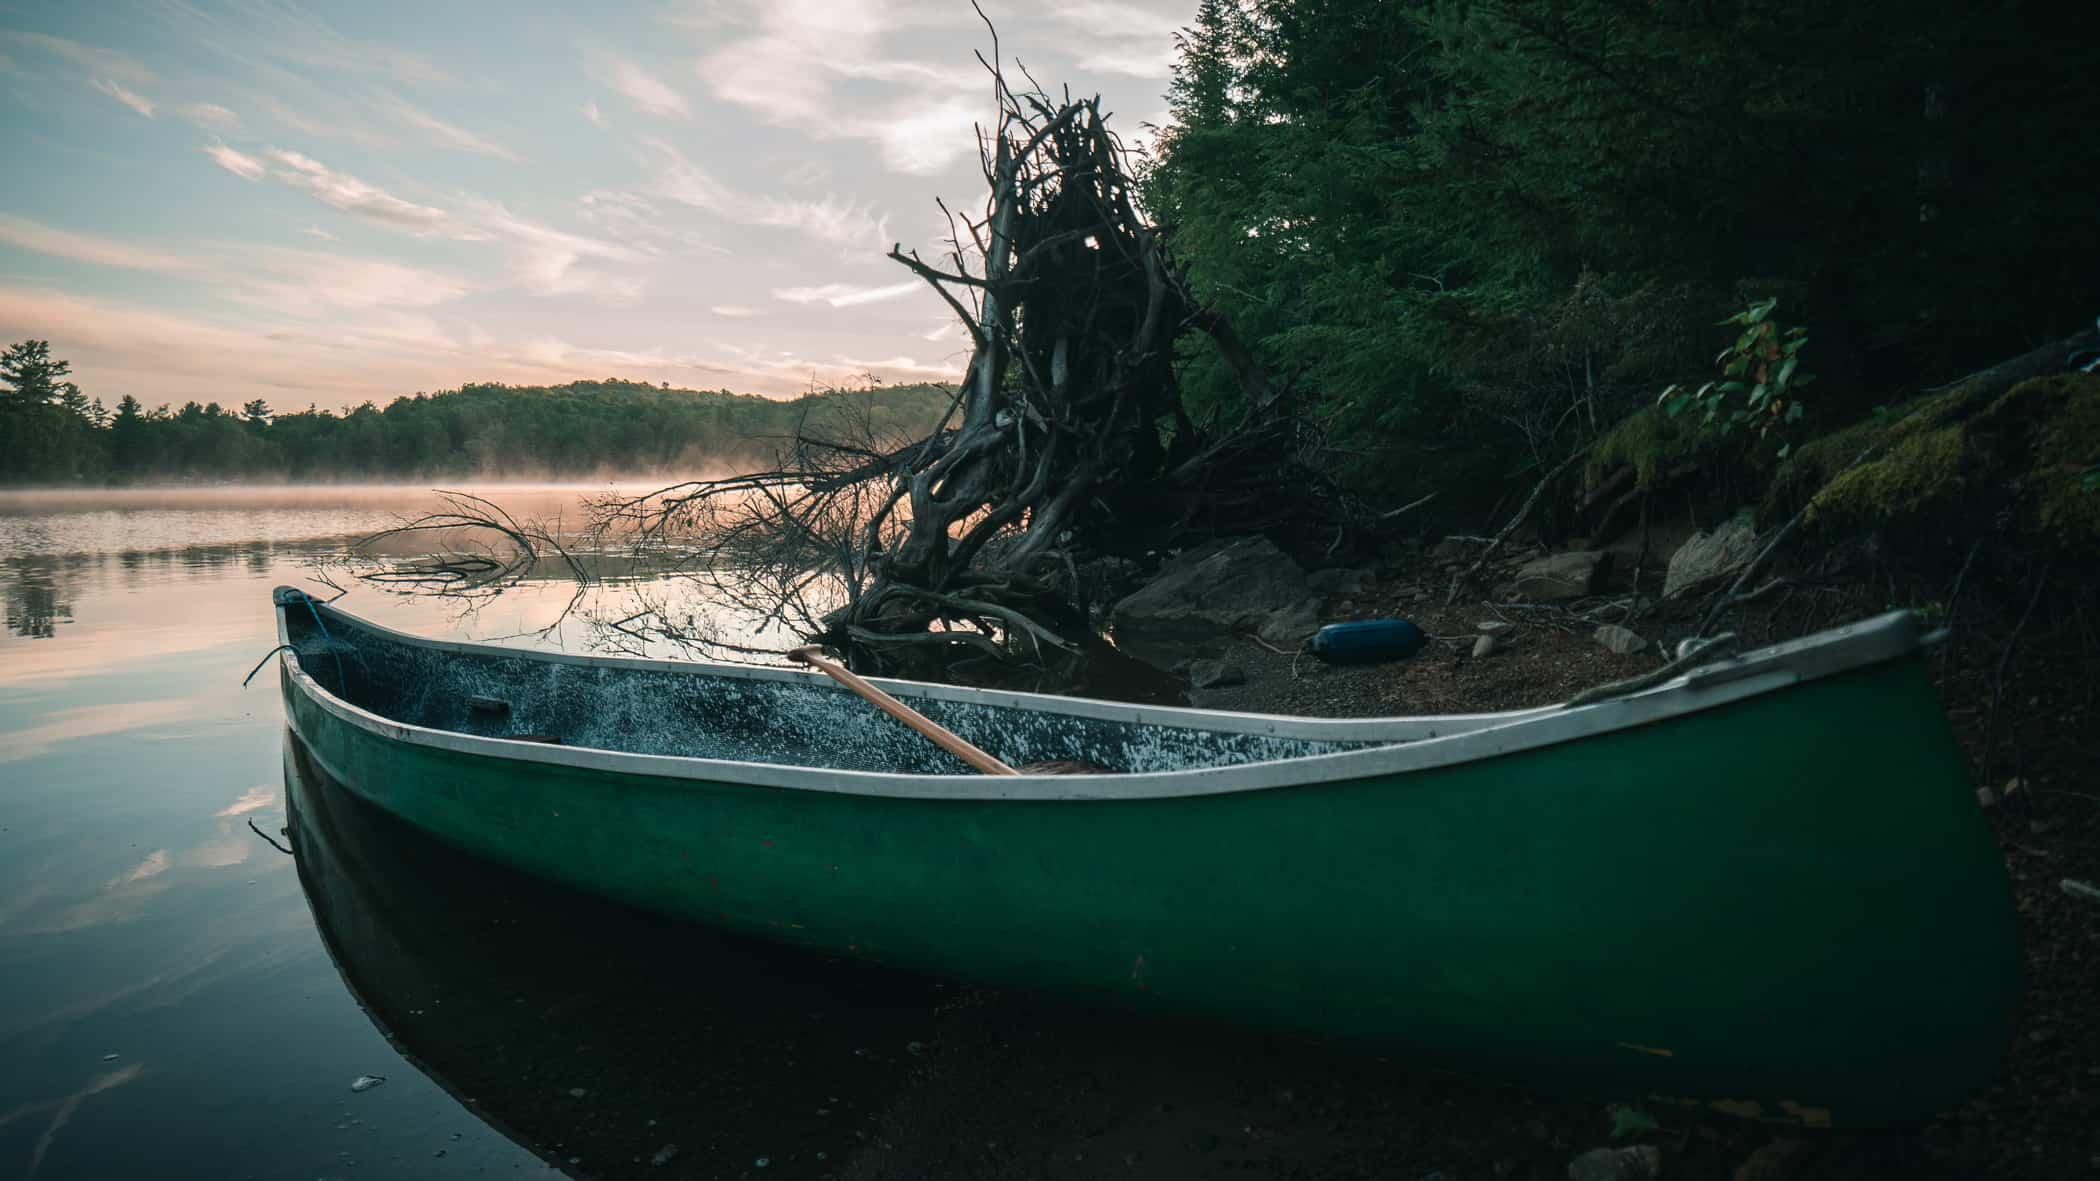 canoe on lake - Derek Sutton